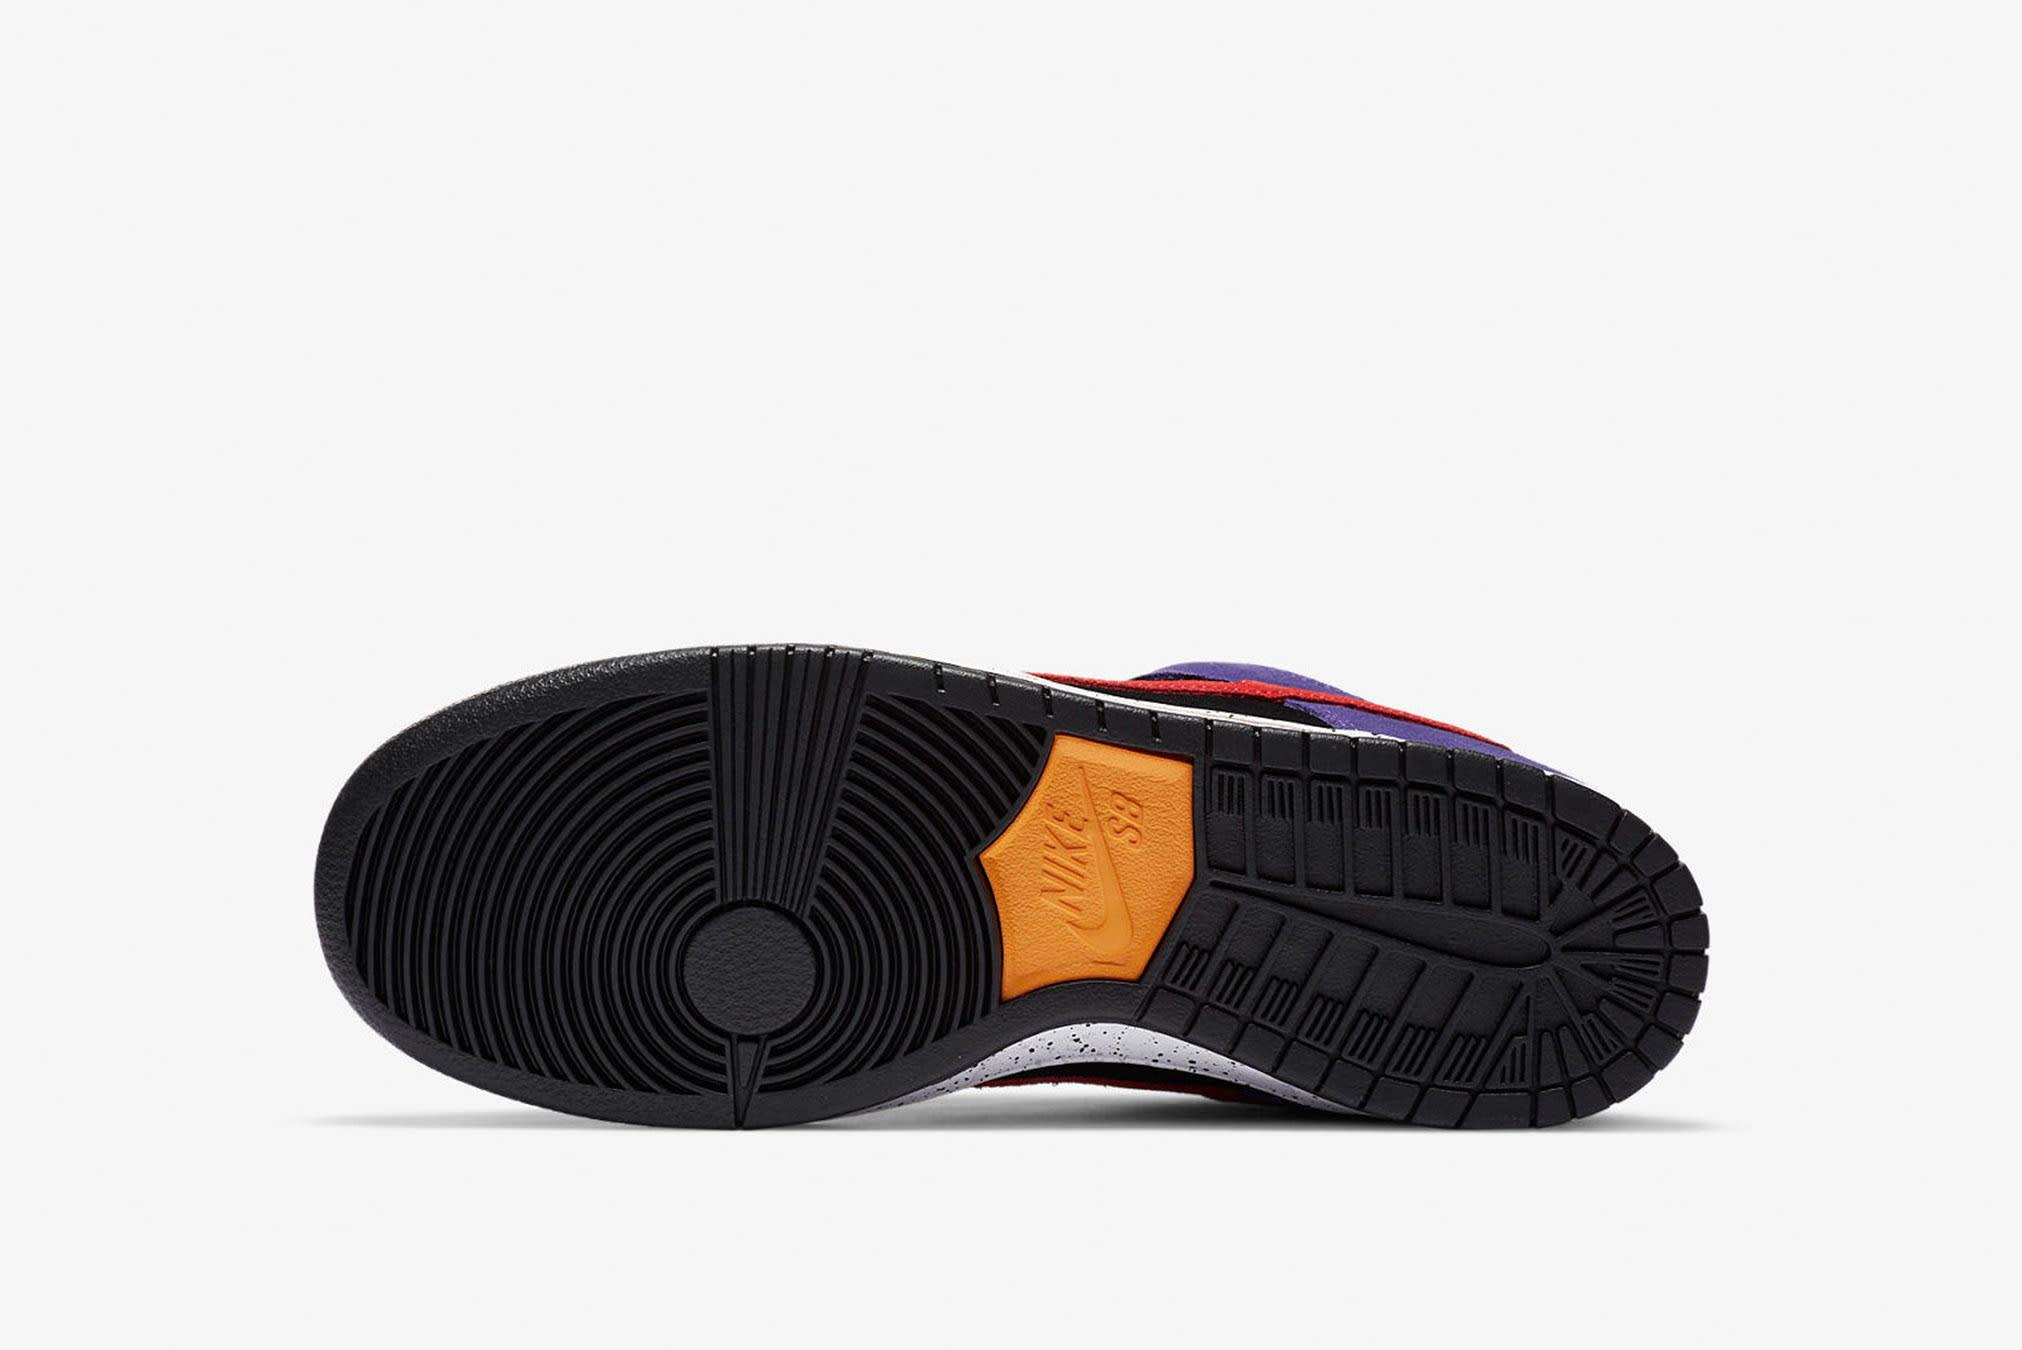 Nike SB Dunk Low Pro - BQ6817-008